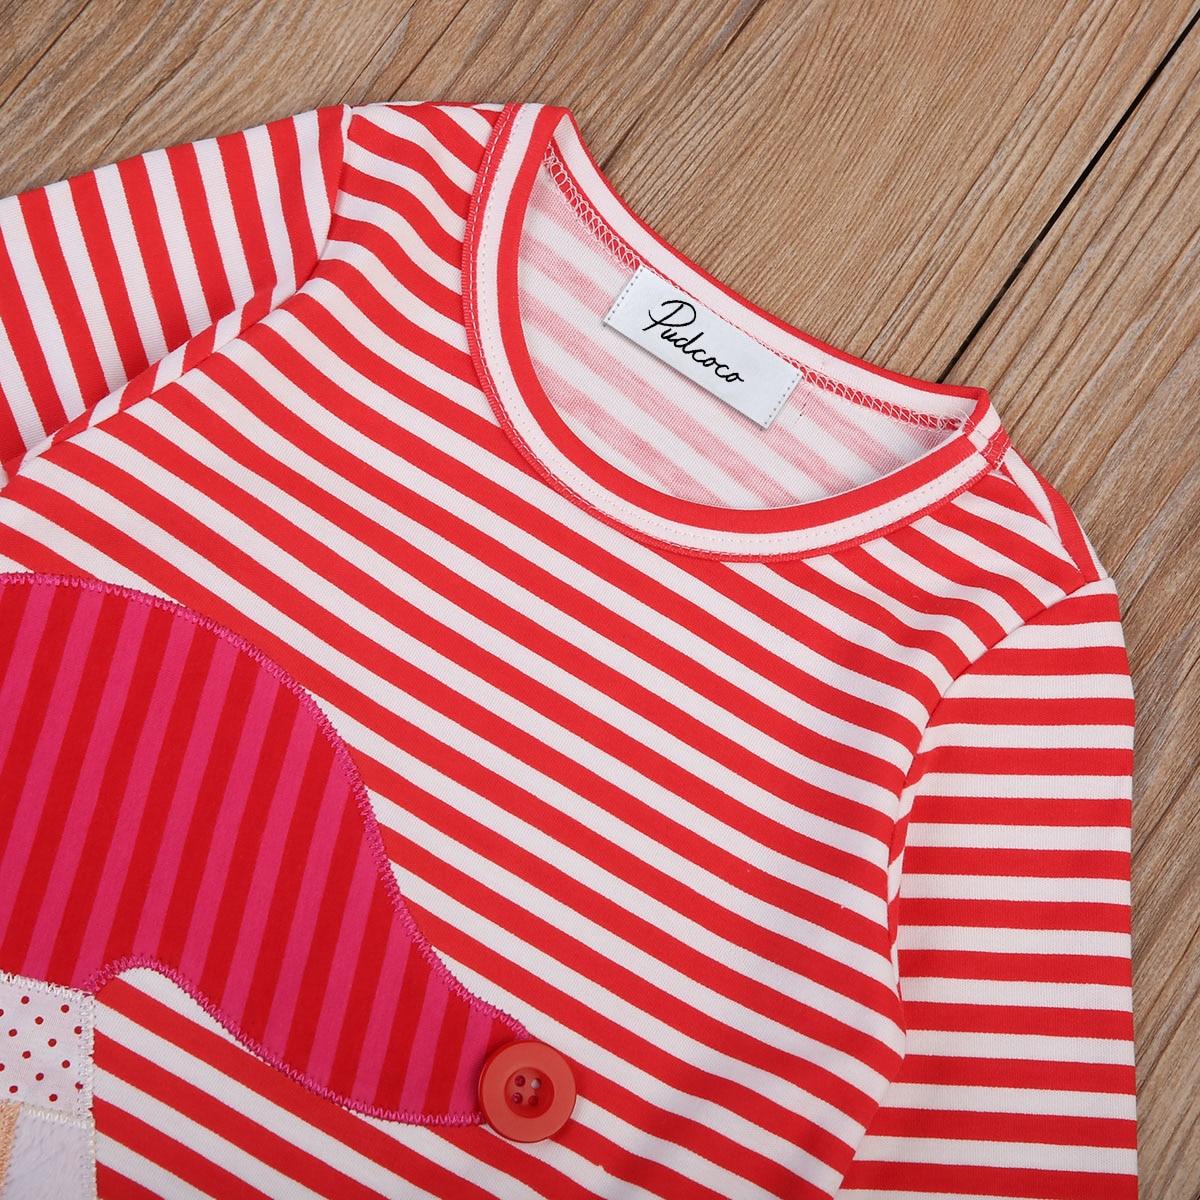 2017 Kids Toddler Baby Girls Christmas Nightdress Santa Claus Striped Long Sleeve Dresses Cute Cotton Loose Dress Clothing 1-7